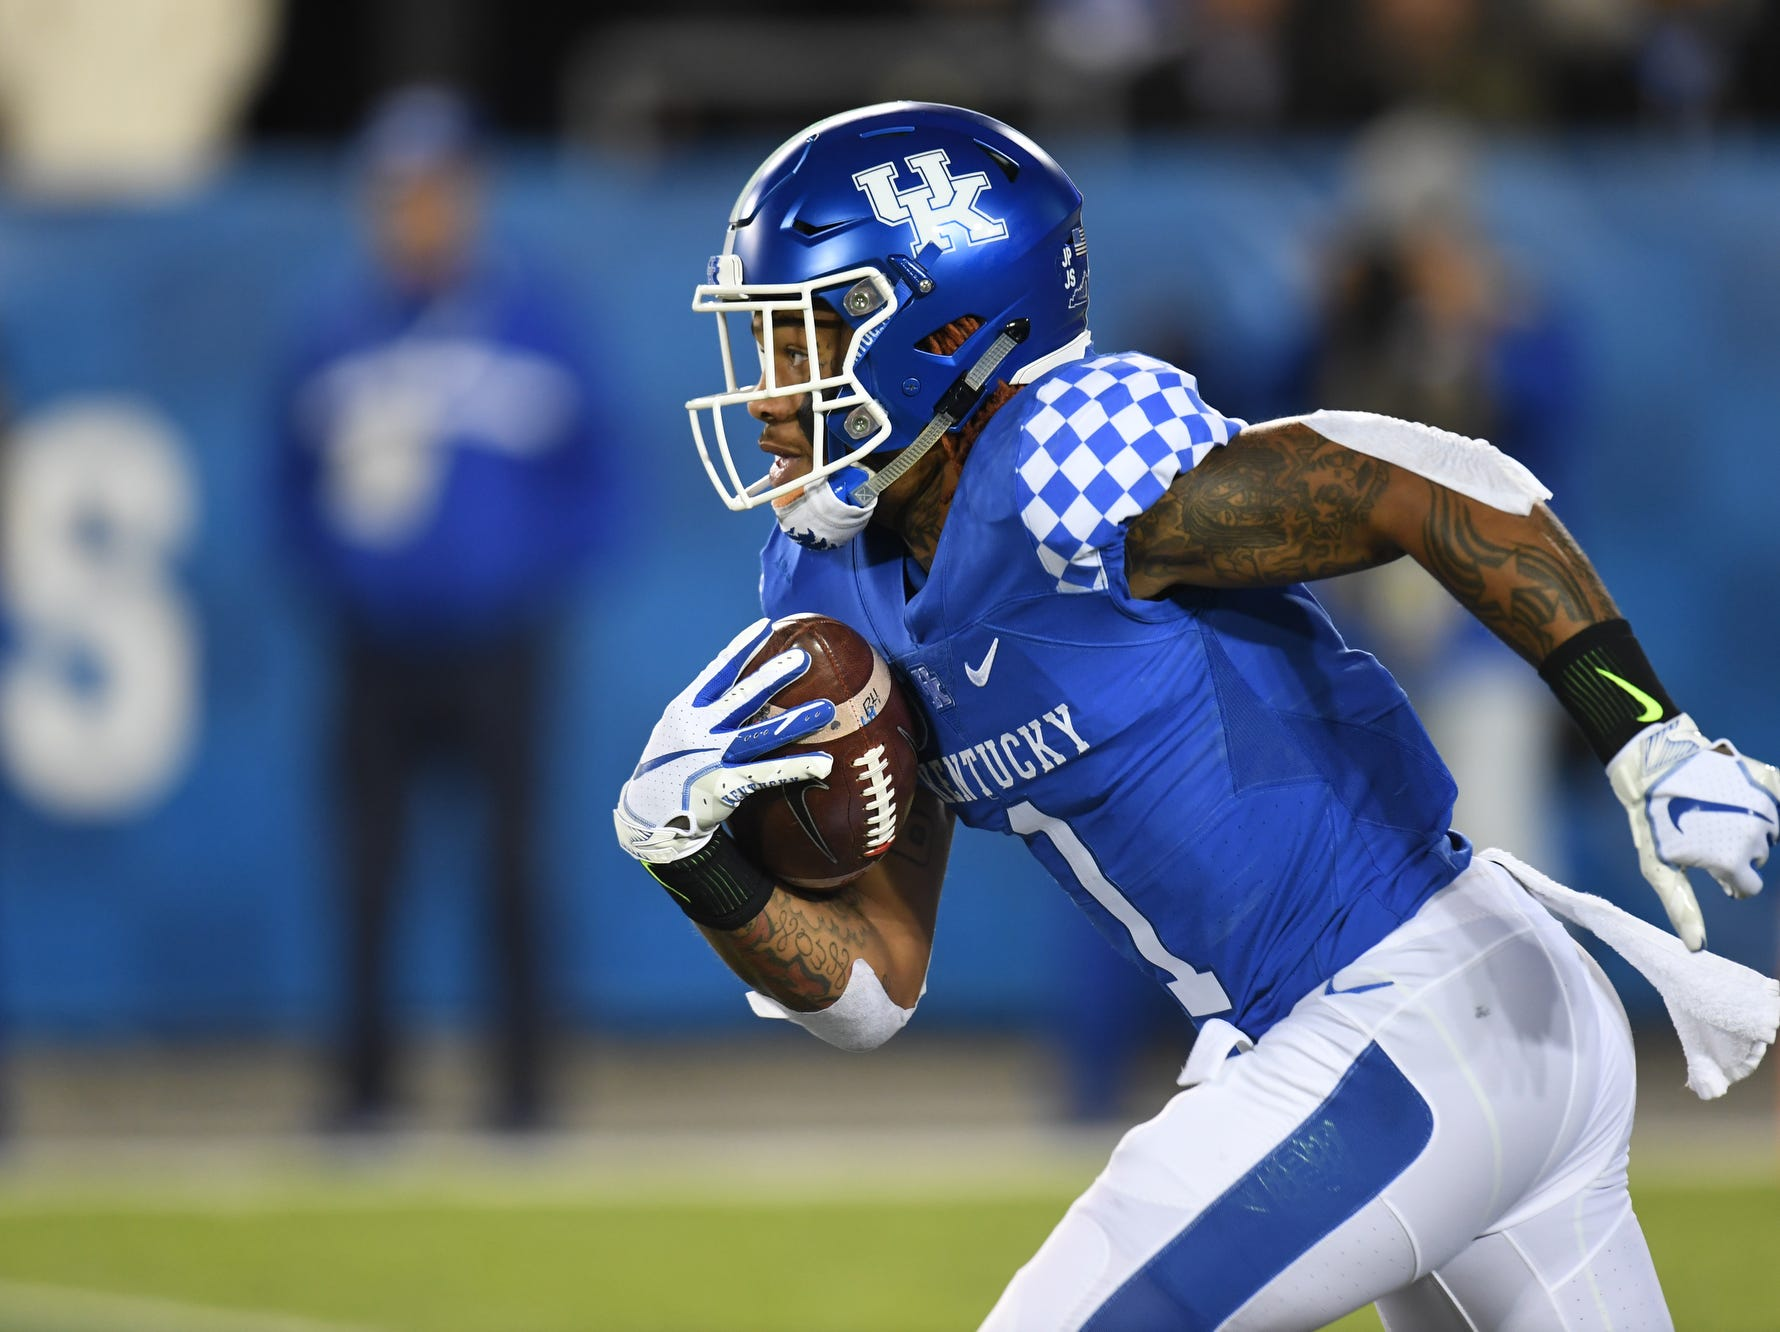 UK WR Lynn Bowden, Jr. runs with the ball during the University of Kentucky football game against Vanderbilt at Kroger Field in Lexington, Kentucky on Saturday, October 20, 2018.